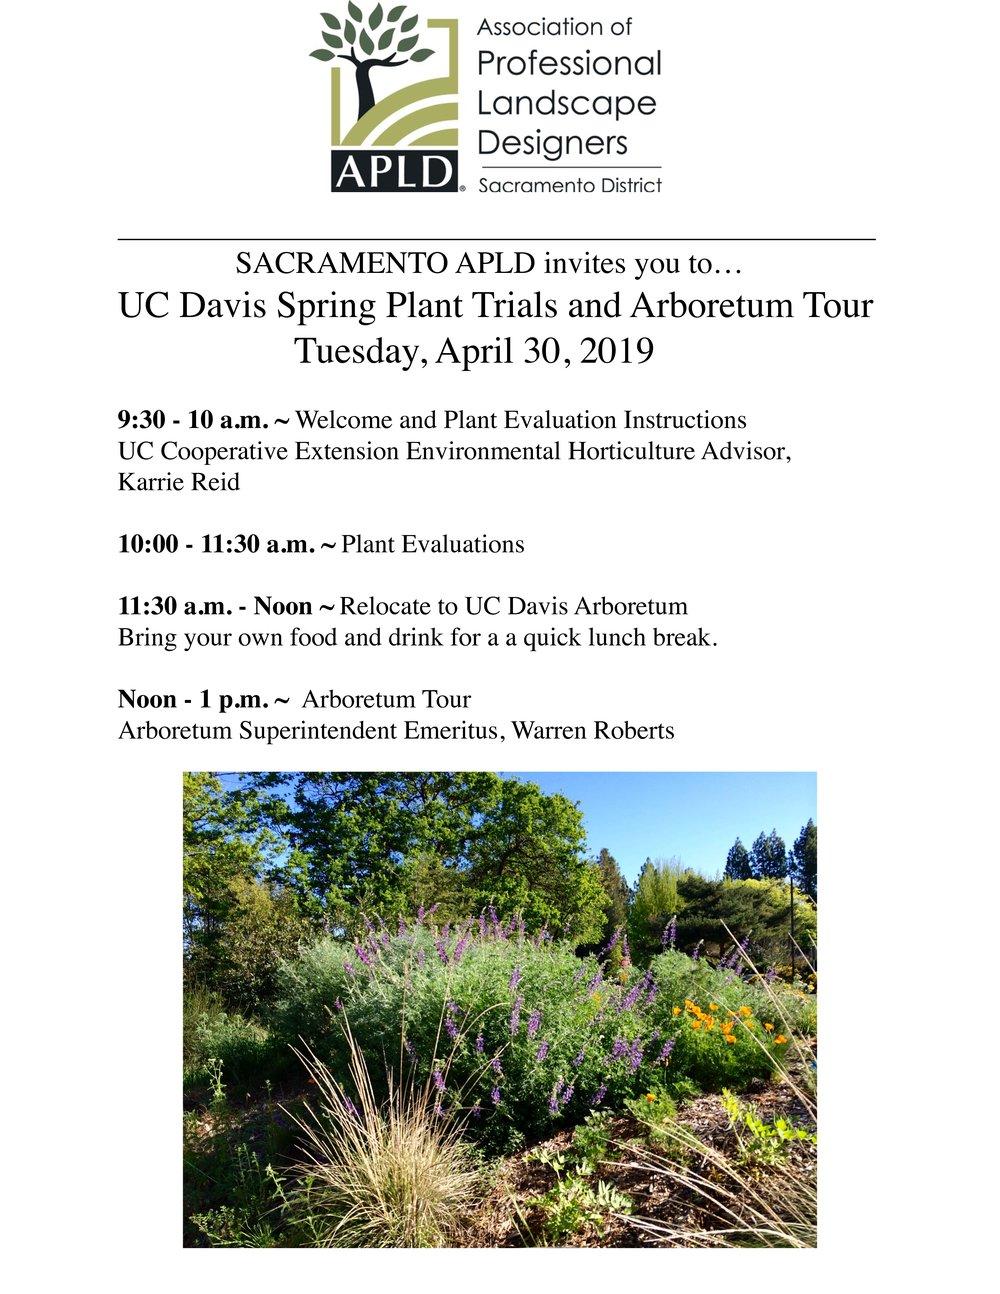 APLD - UC DAVIS TRIALS_TOUR_1.jpg